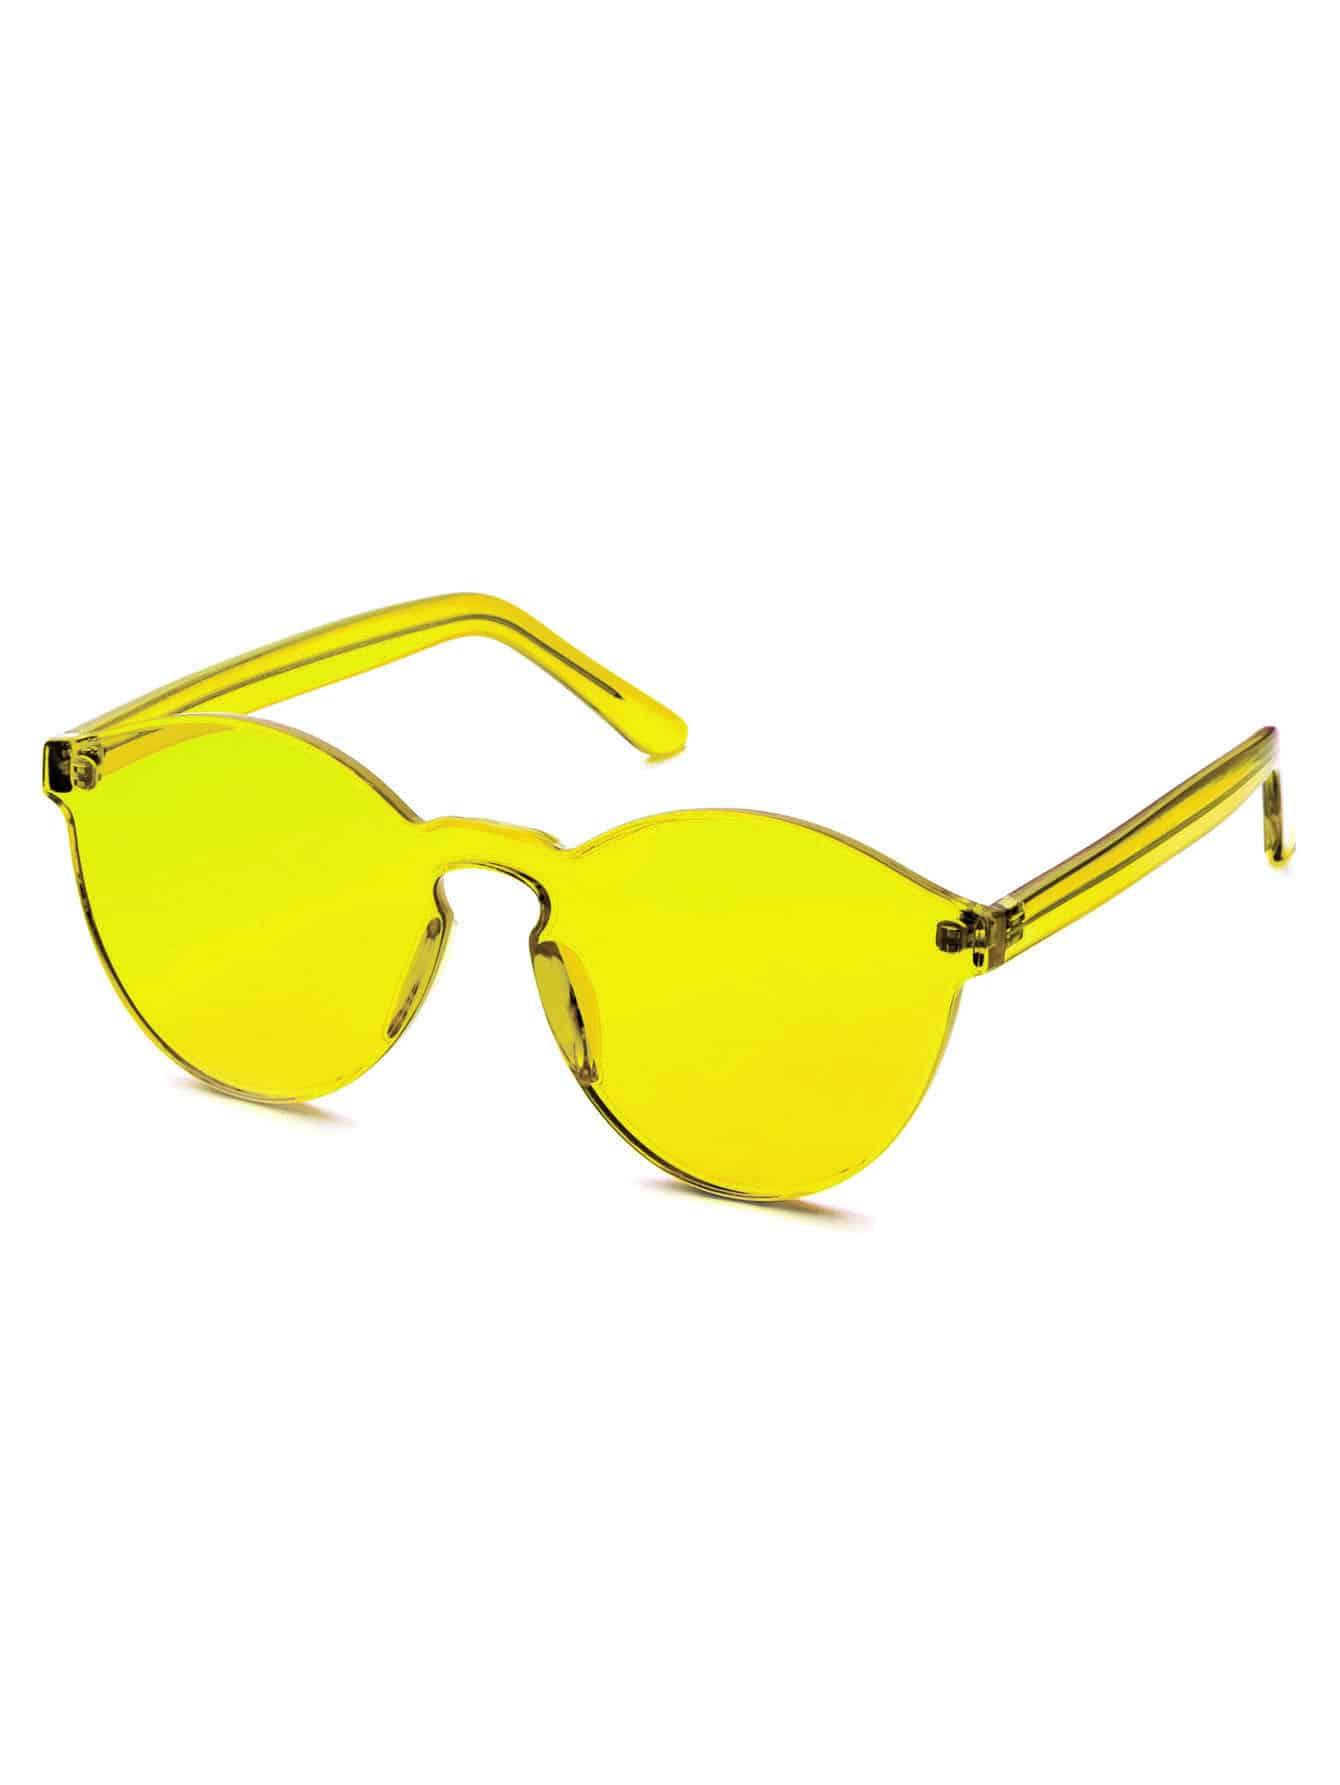 Orange Clear One Piece Retro Style Sunglasses